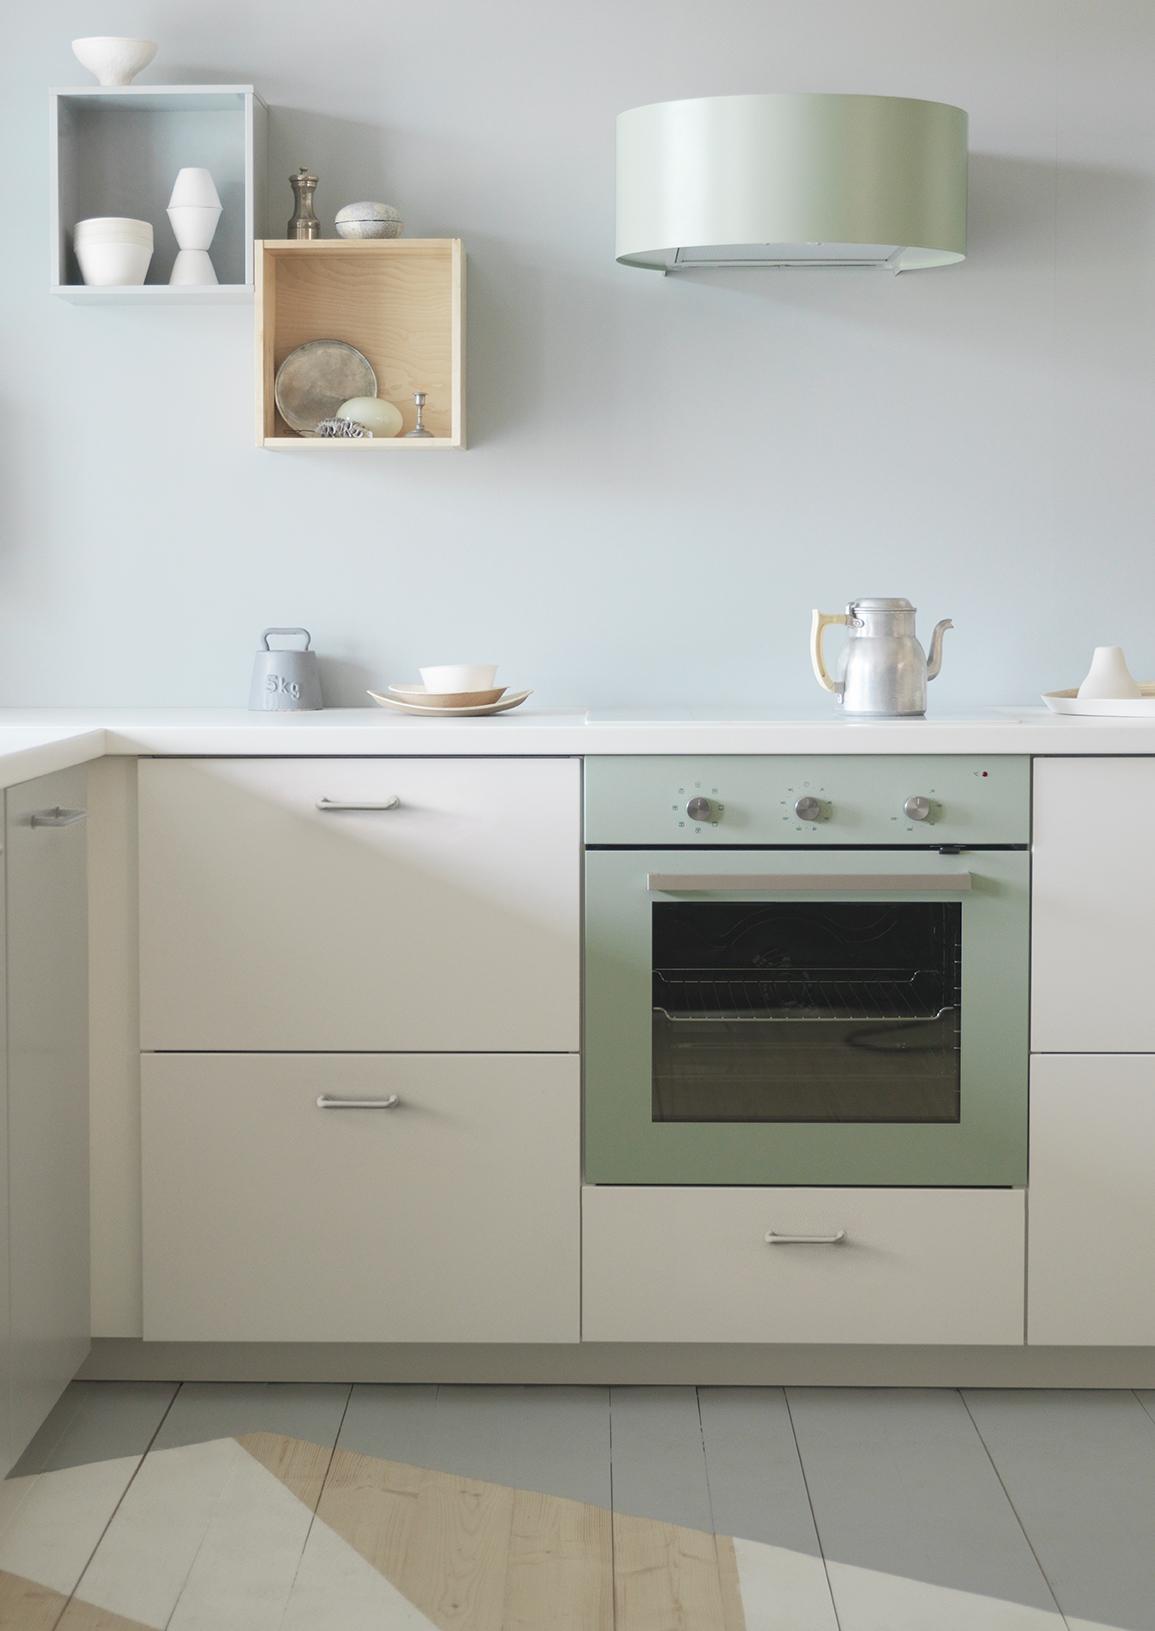 Elegant Günstige Küchenblocks Mit Elektrogeräten